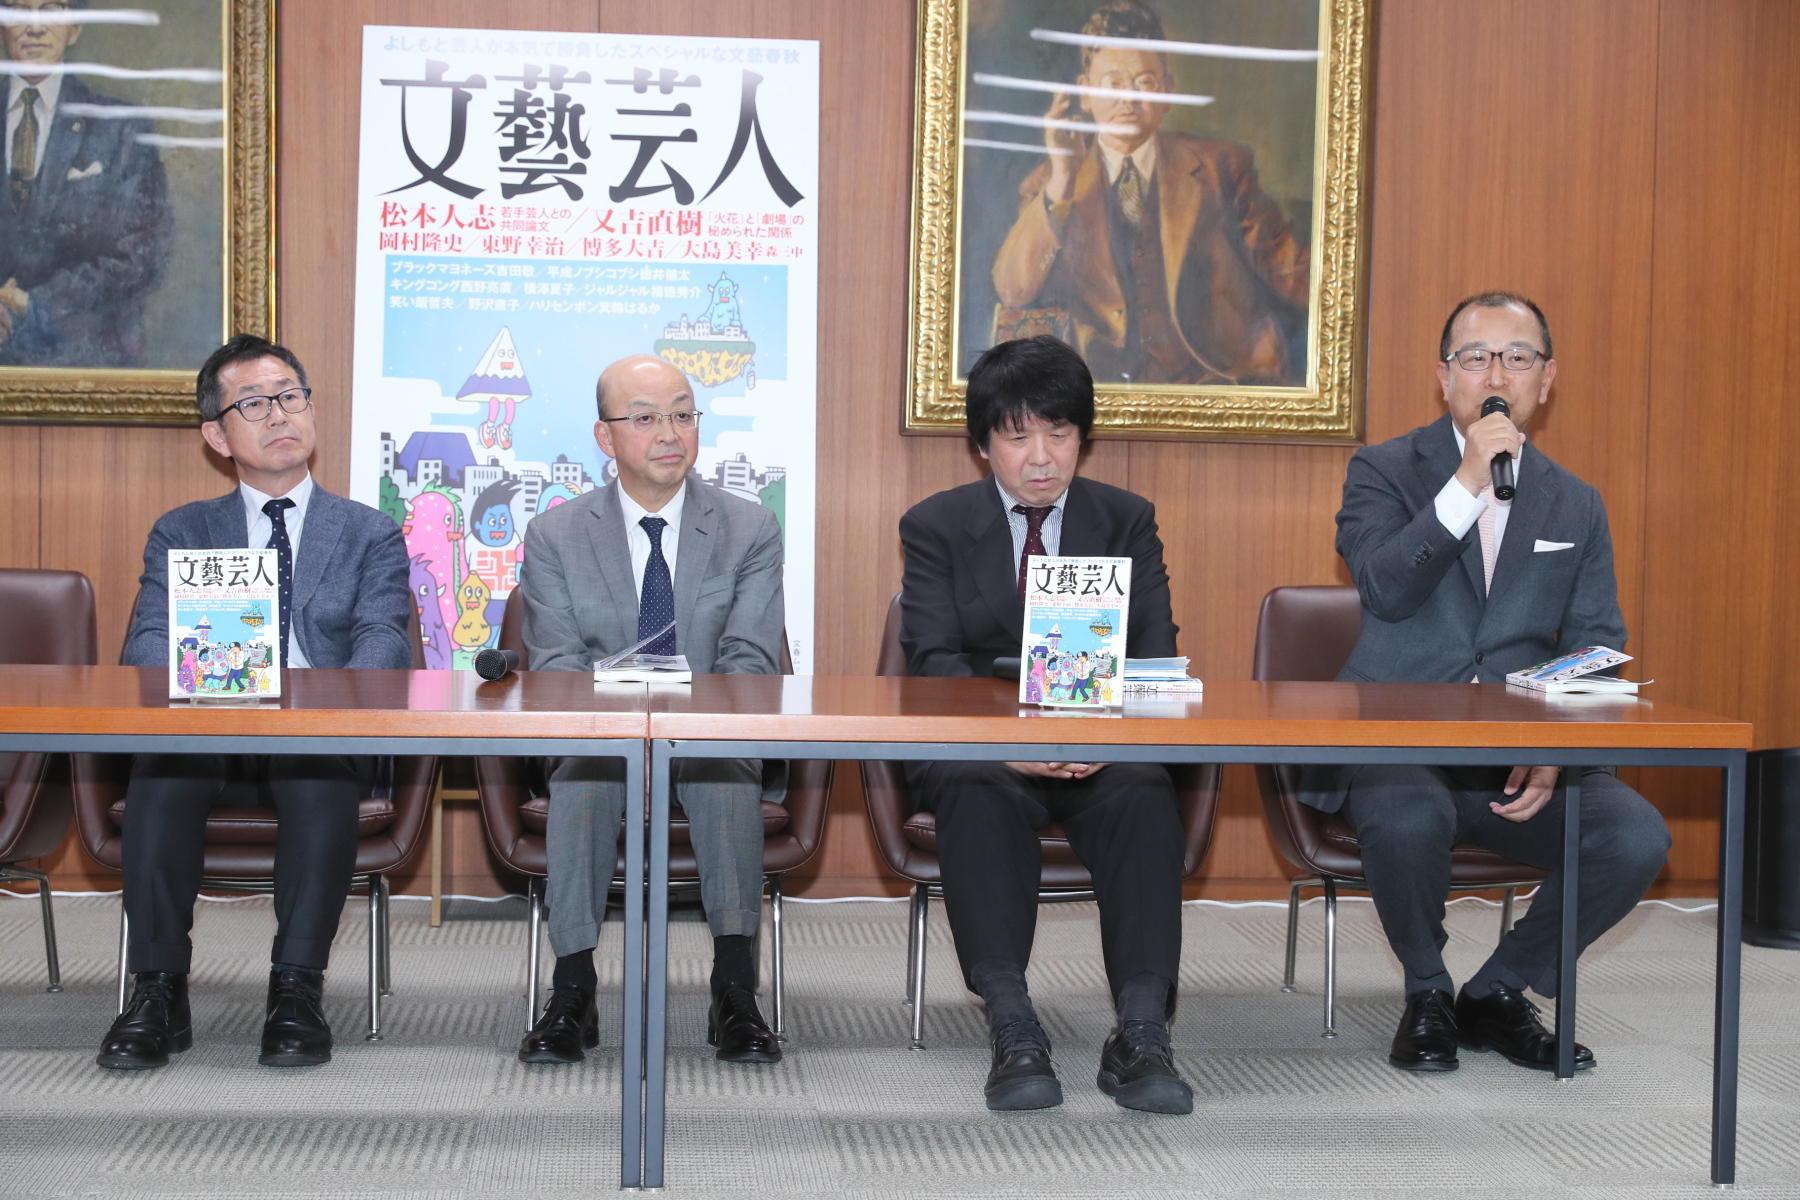 http://news.yoshimoto.co.jp/20170316201631-9f7620ee126d71ea785d386b0328a8c275d8e42a.jpg